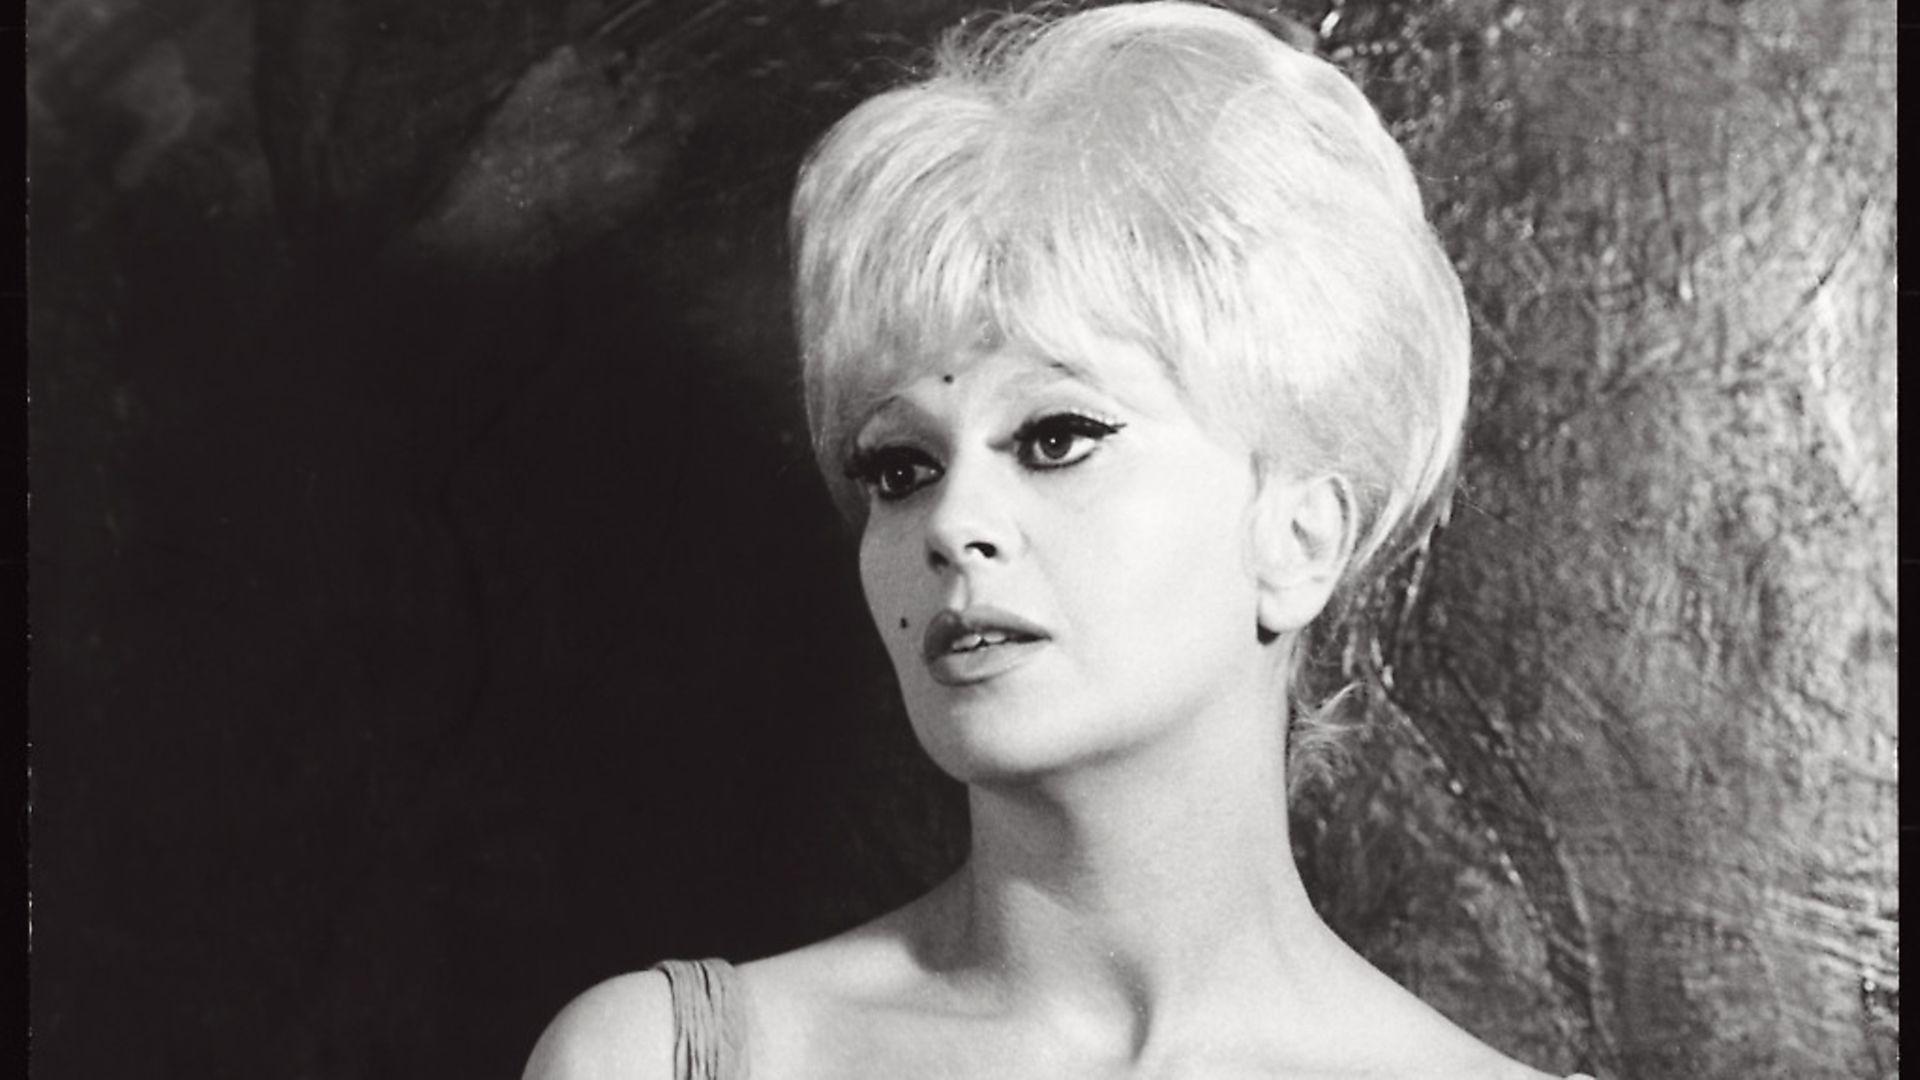 Portrait of Italian actress Franca Rame. 1960s Photo: Mondadori Portfolio by Getty Images. - Credit: Mondadori via Getty Images